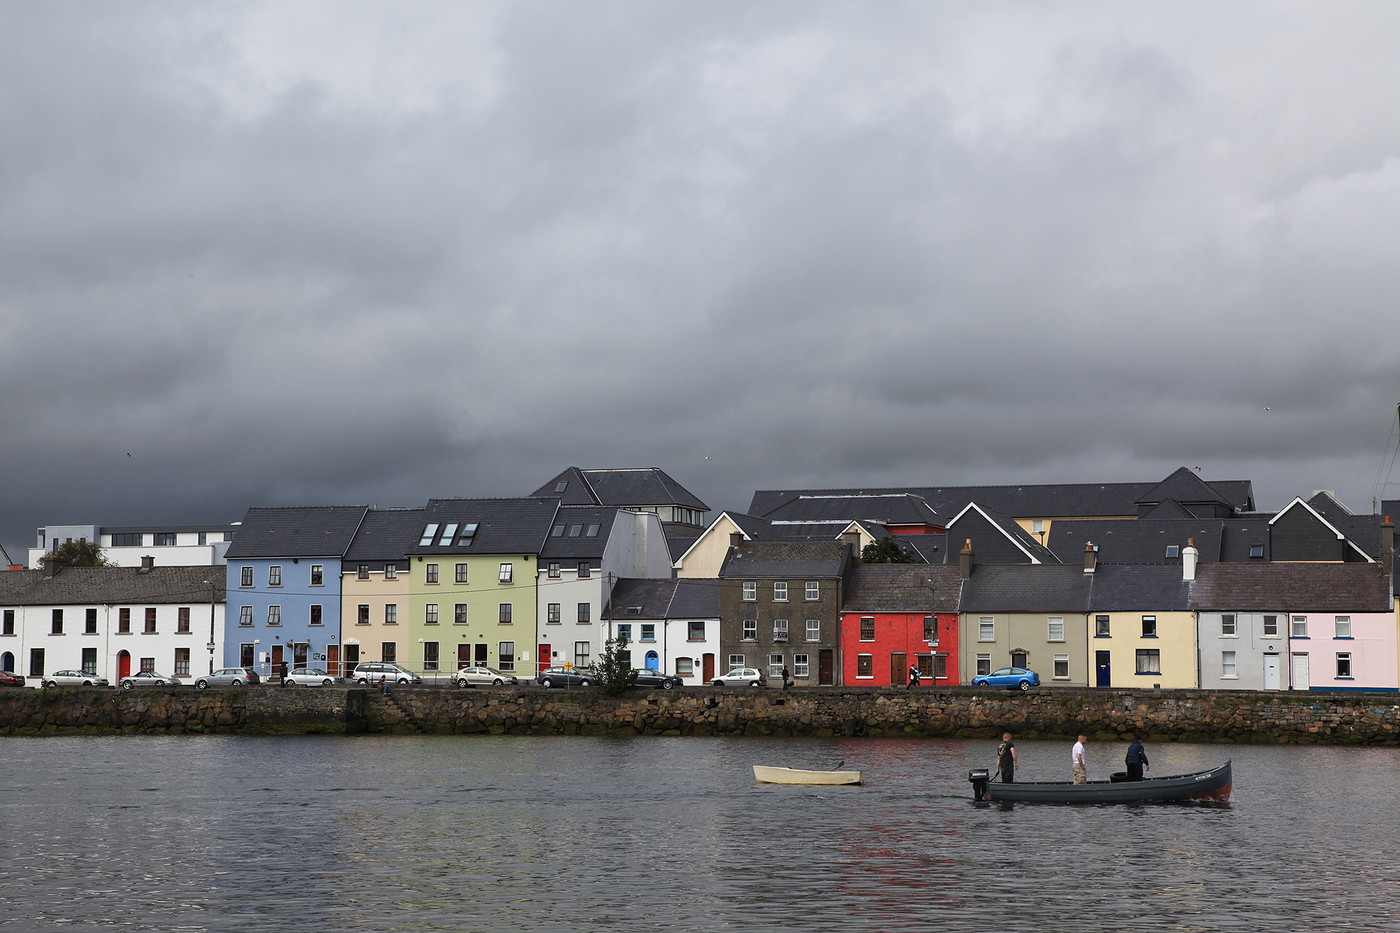 Irlande jl - site internet 007.jpg